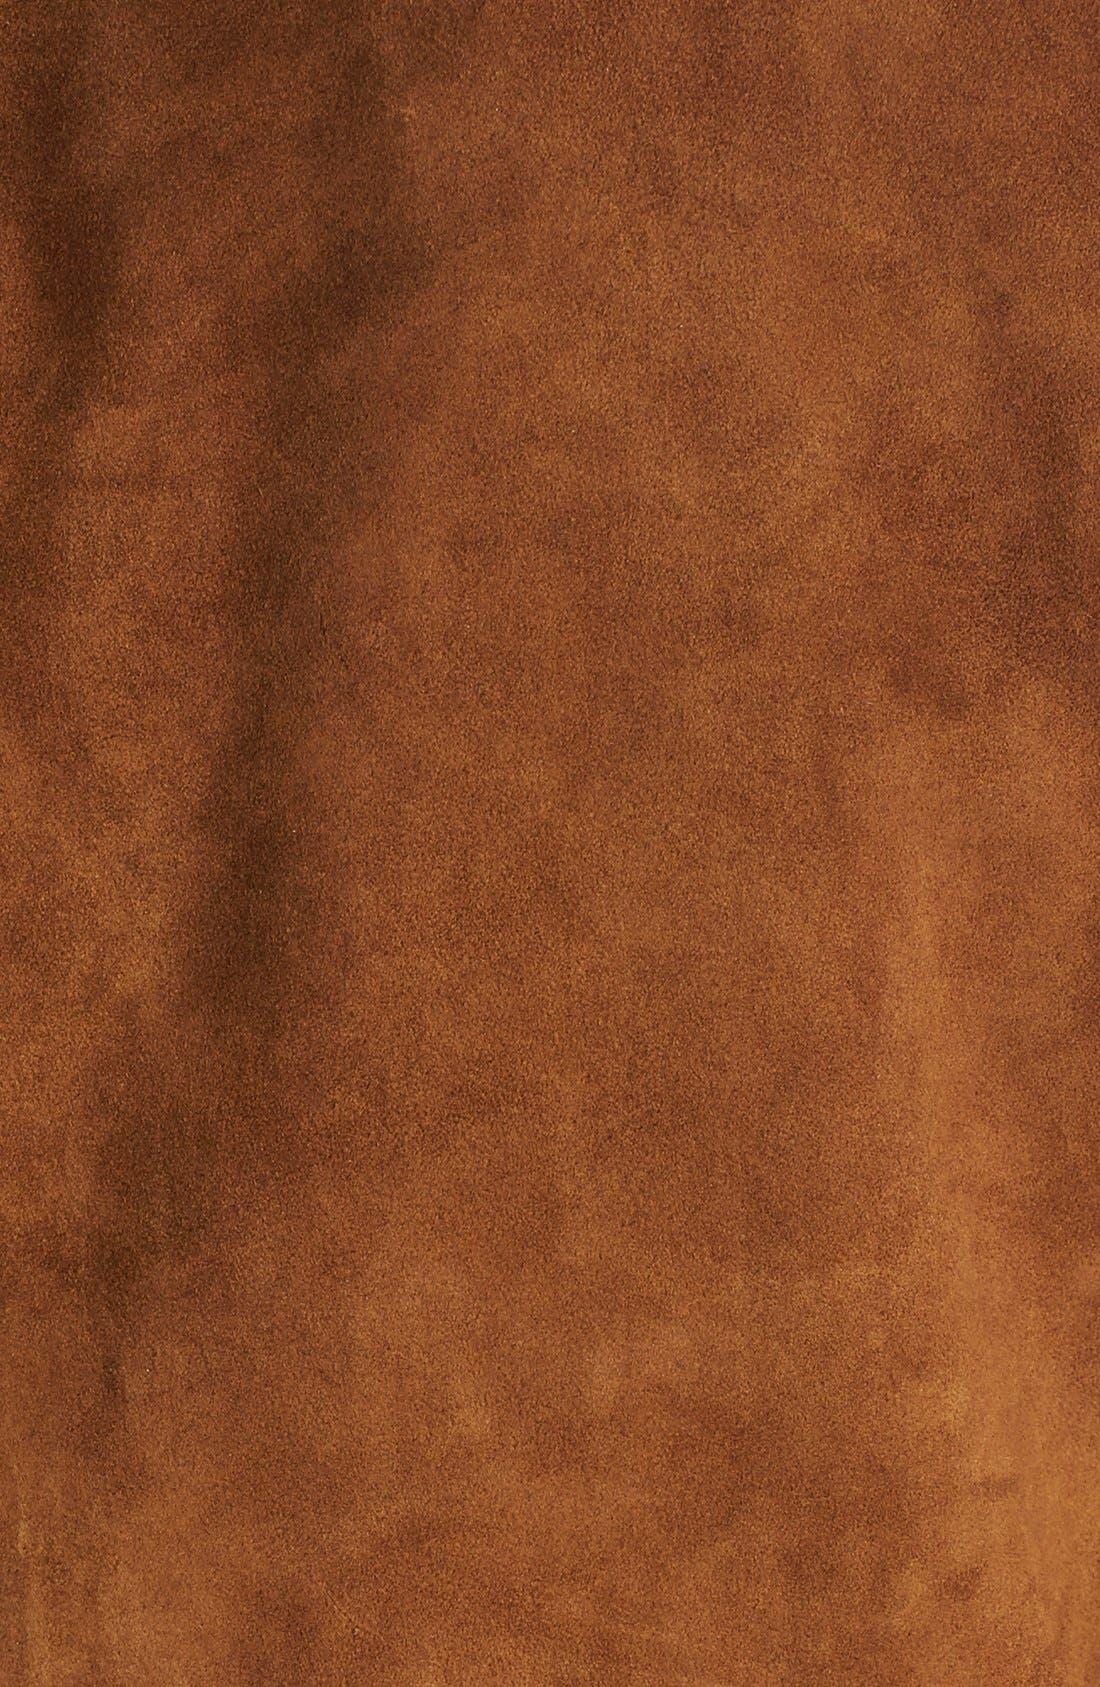 'Blaine' Studded Suede Jacket,                             Alternate thumbnail 5, color,                             Tobacco